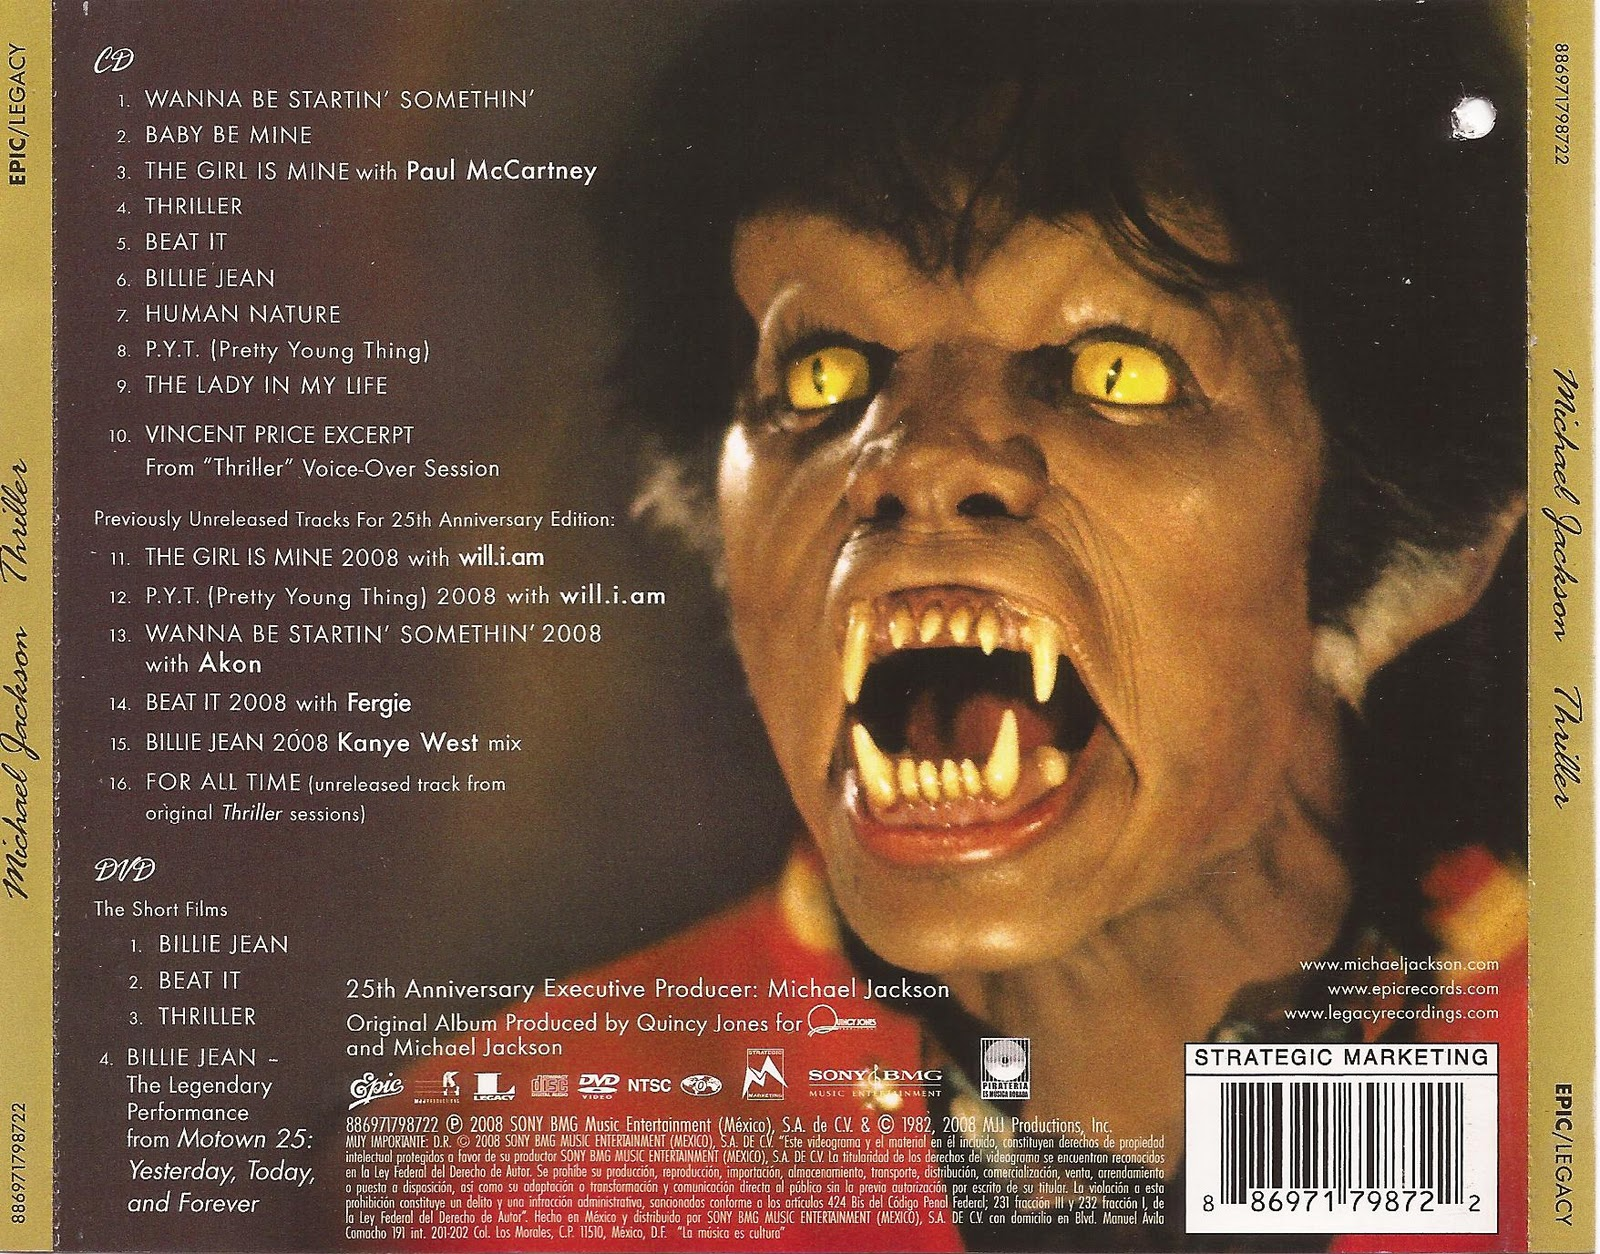 http://4.bp.blogspot.com/-MmoUHXyMQWg/TqY5_zaltXI/AAAAAAAAAnY/AuIVomPM4U0/s1600/Contraportada+Michael+Jackson+Thriller+25.jpg